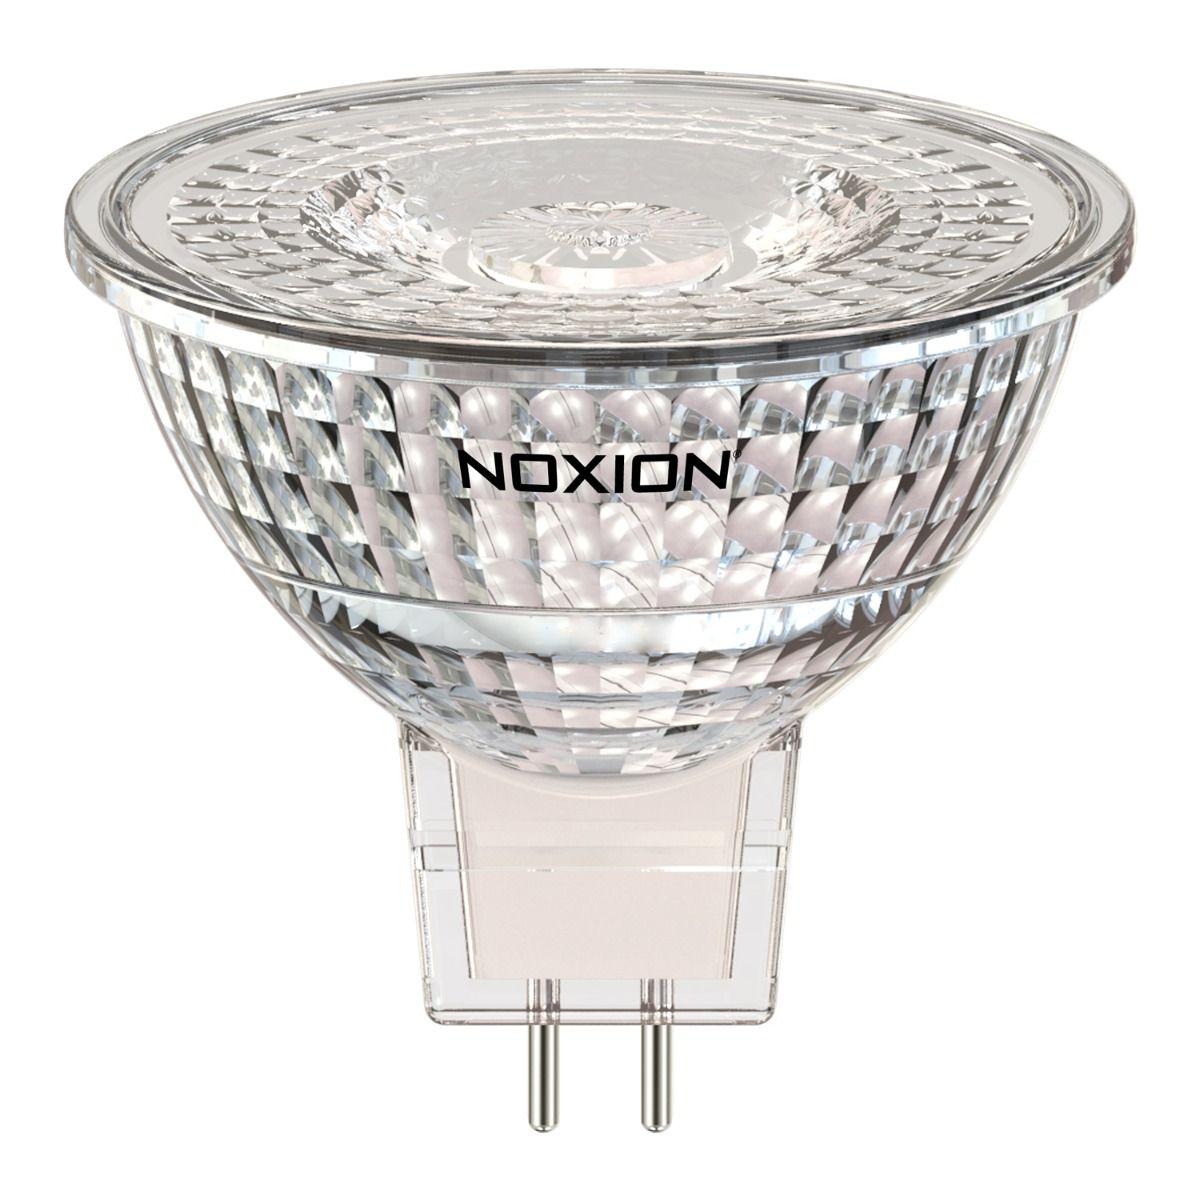 Noxion LED Spot GU5.3 4.5W 827 36D 400lm   Vervanger voor 35W